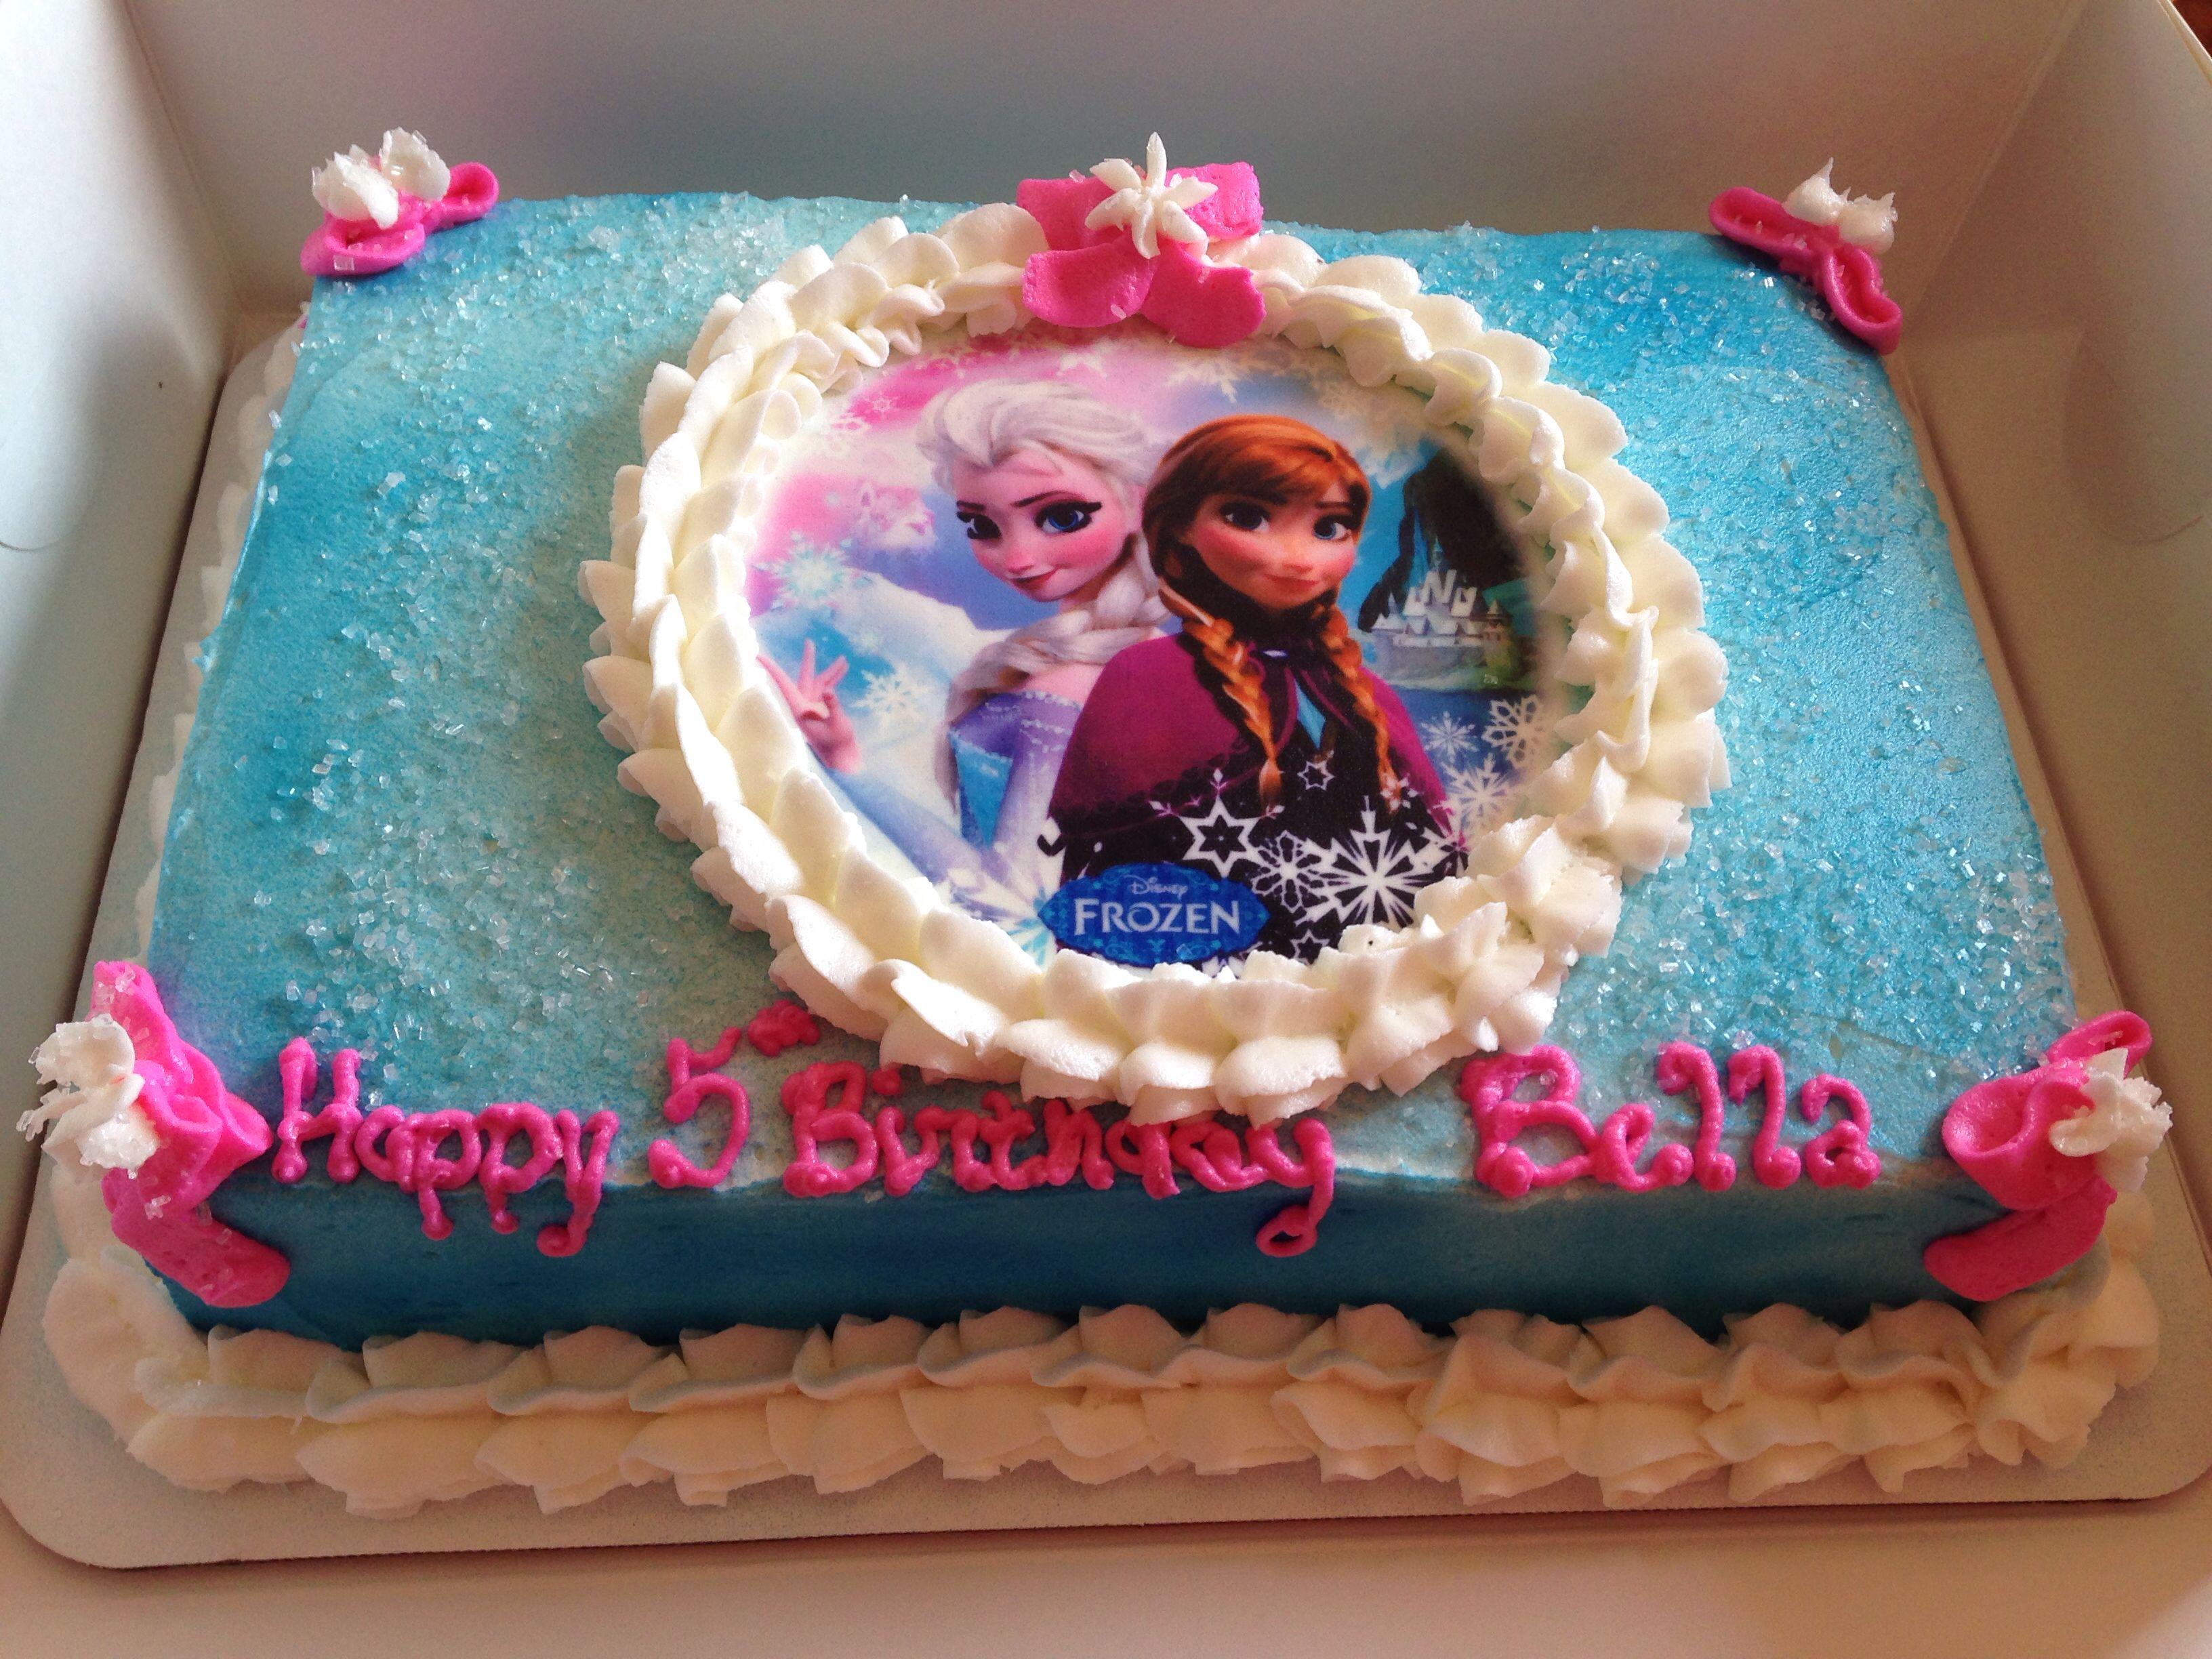 Edible Frozen Image 1 4 Sheet Cake Airbrushed Buttercream Cake